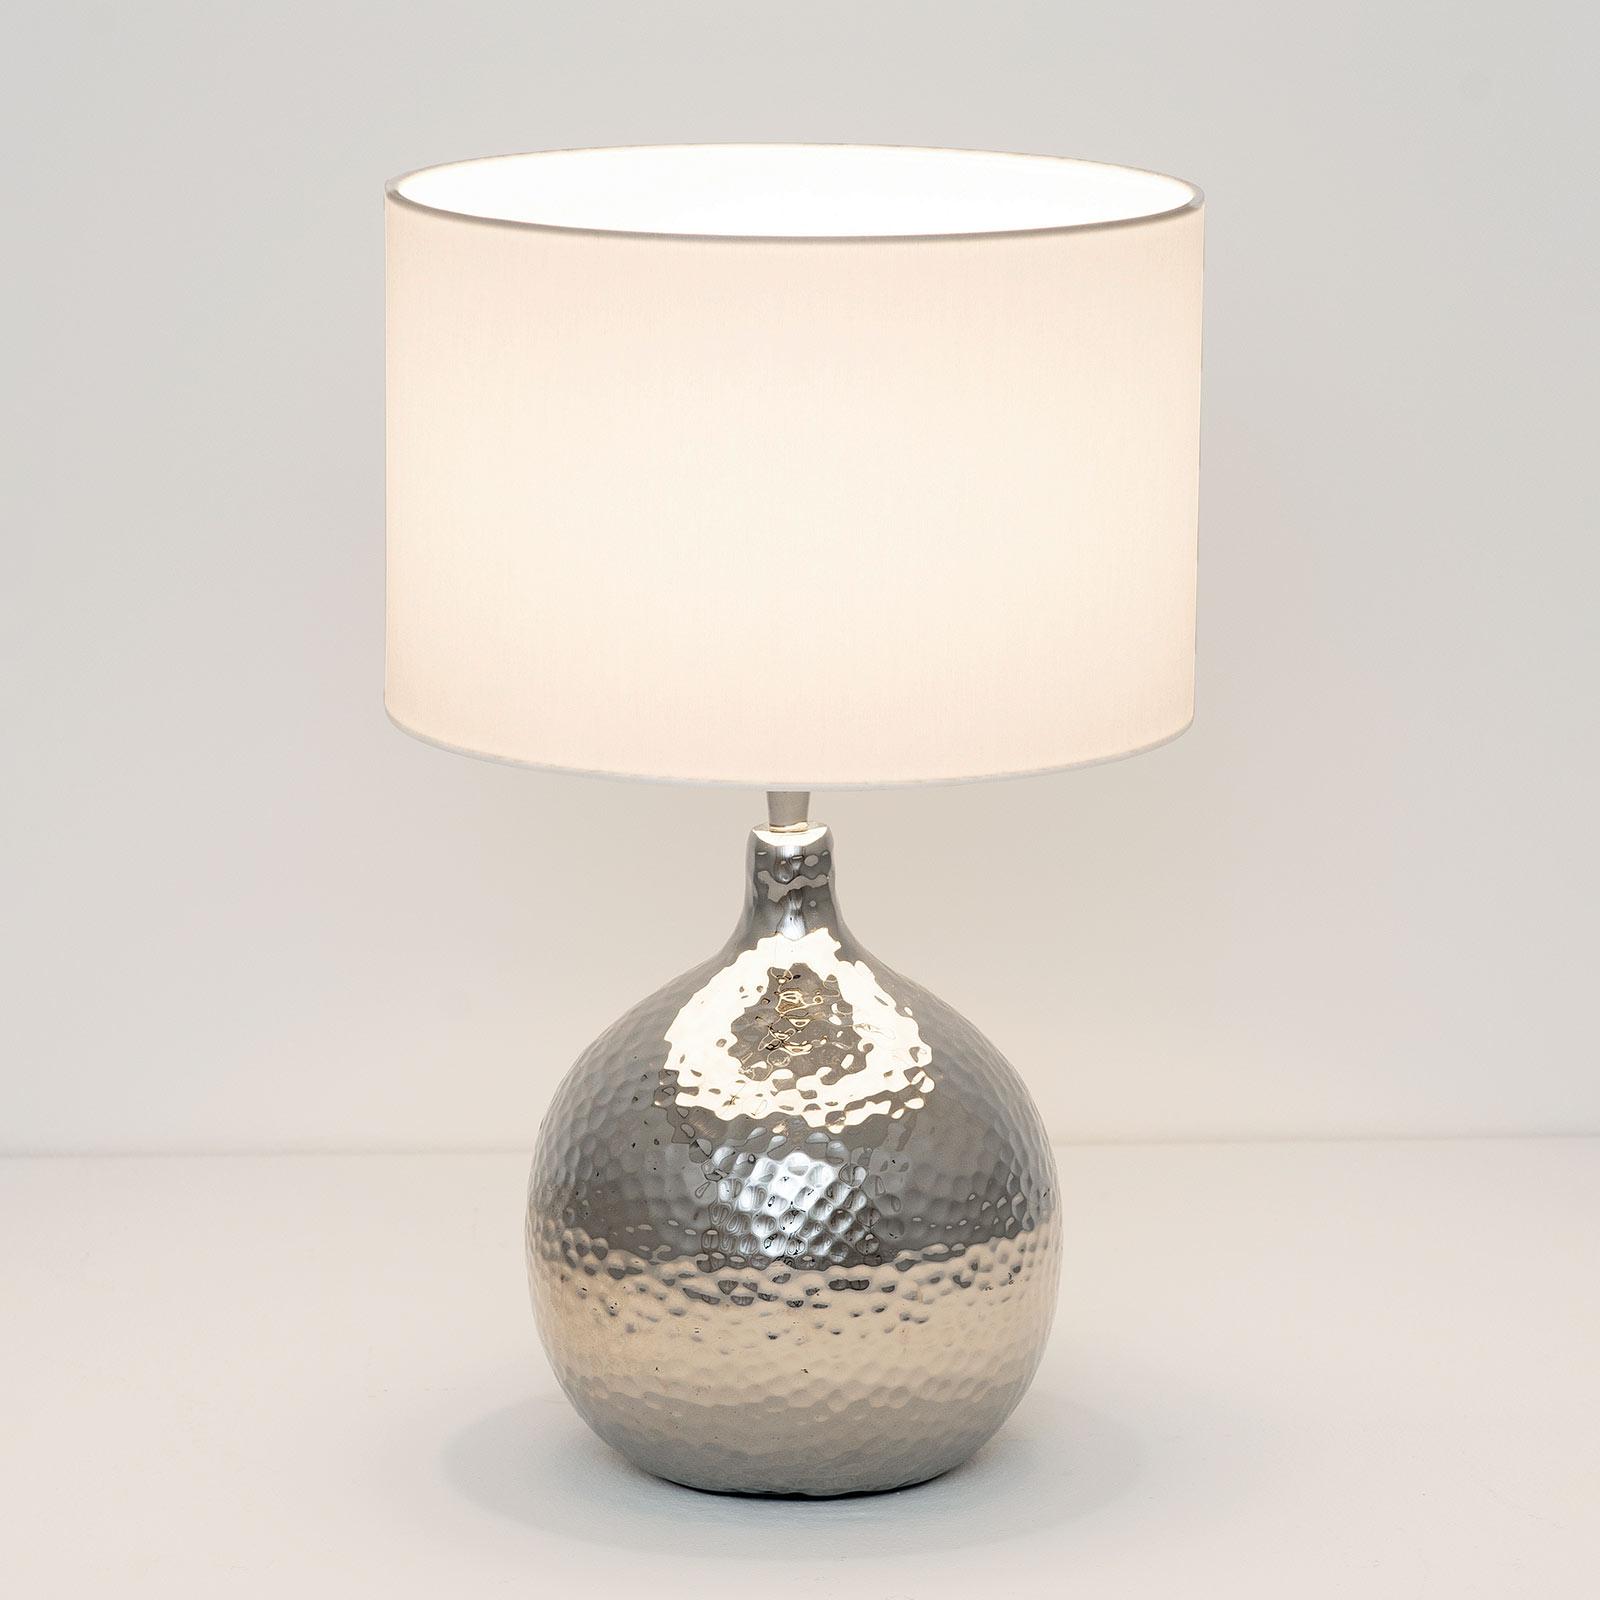 Lampada da tavolo Ananas, bianca/argento